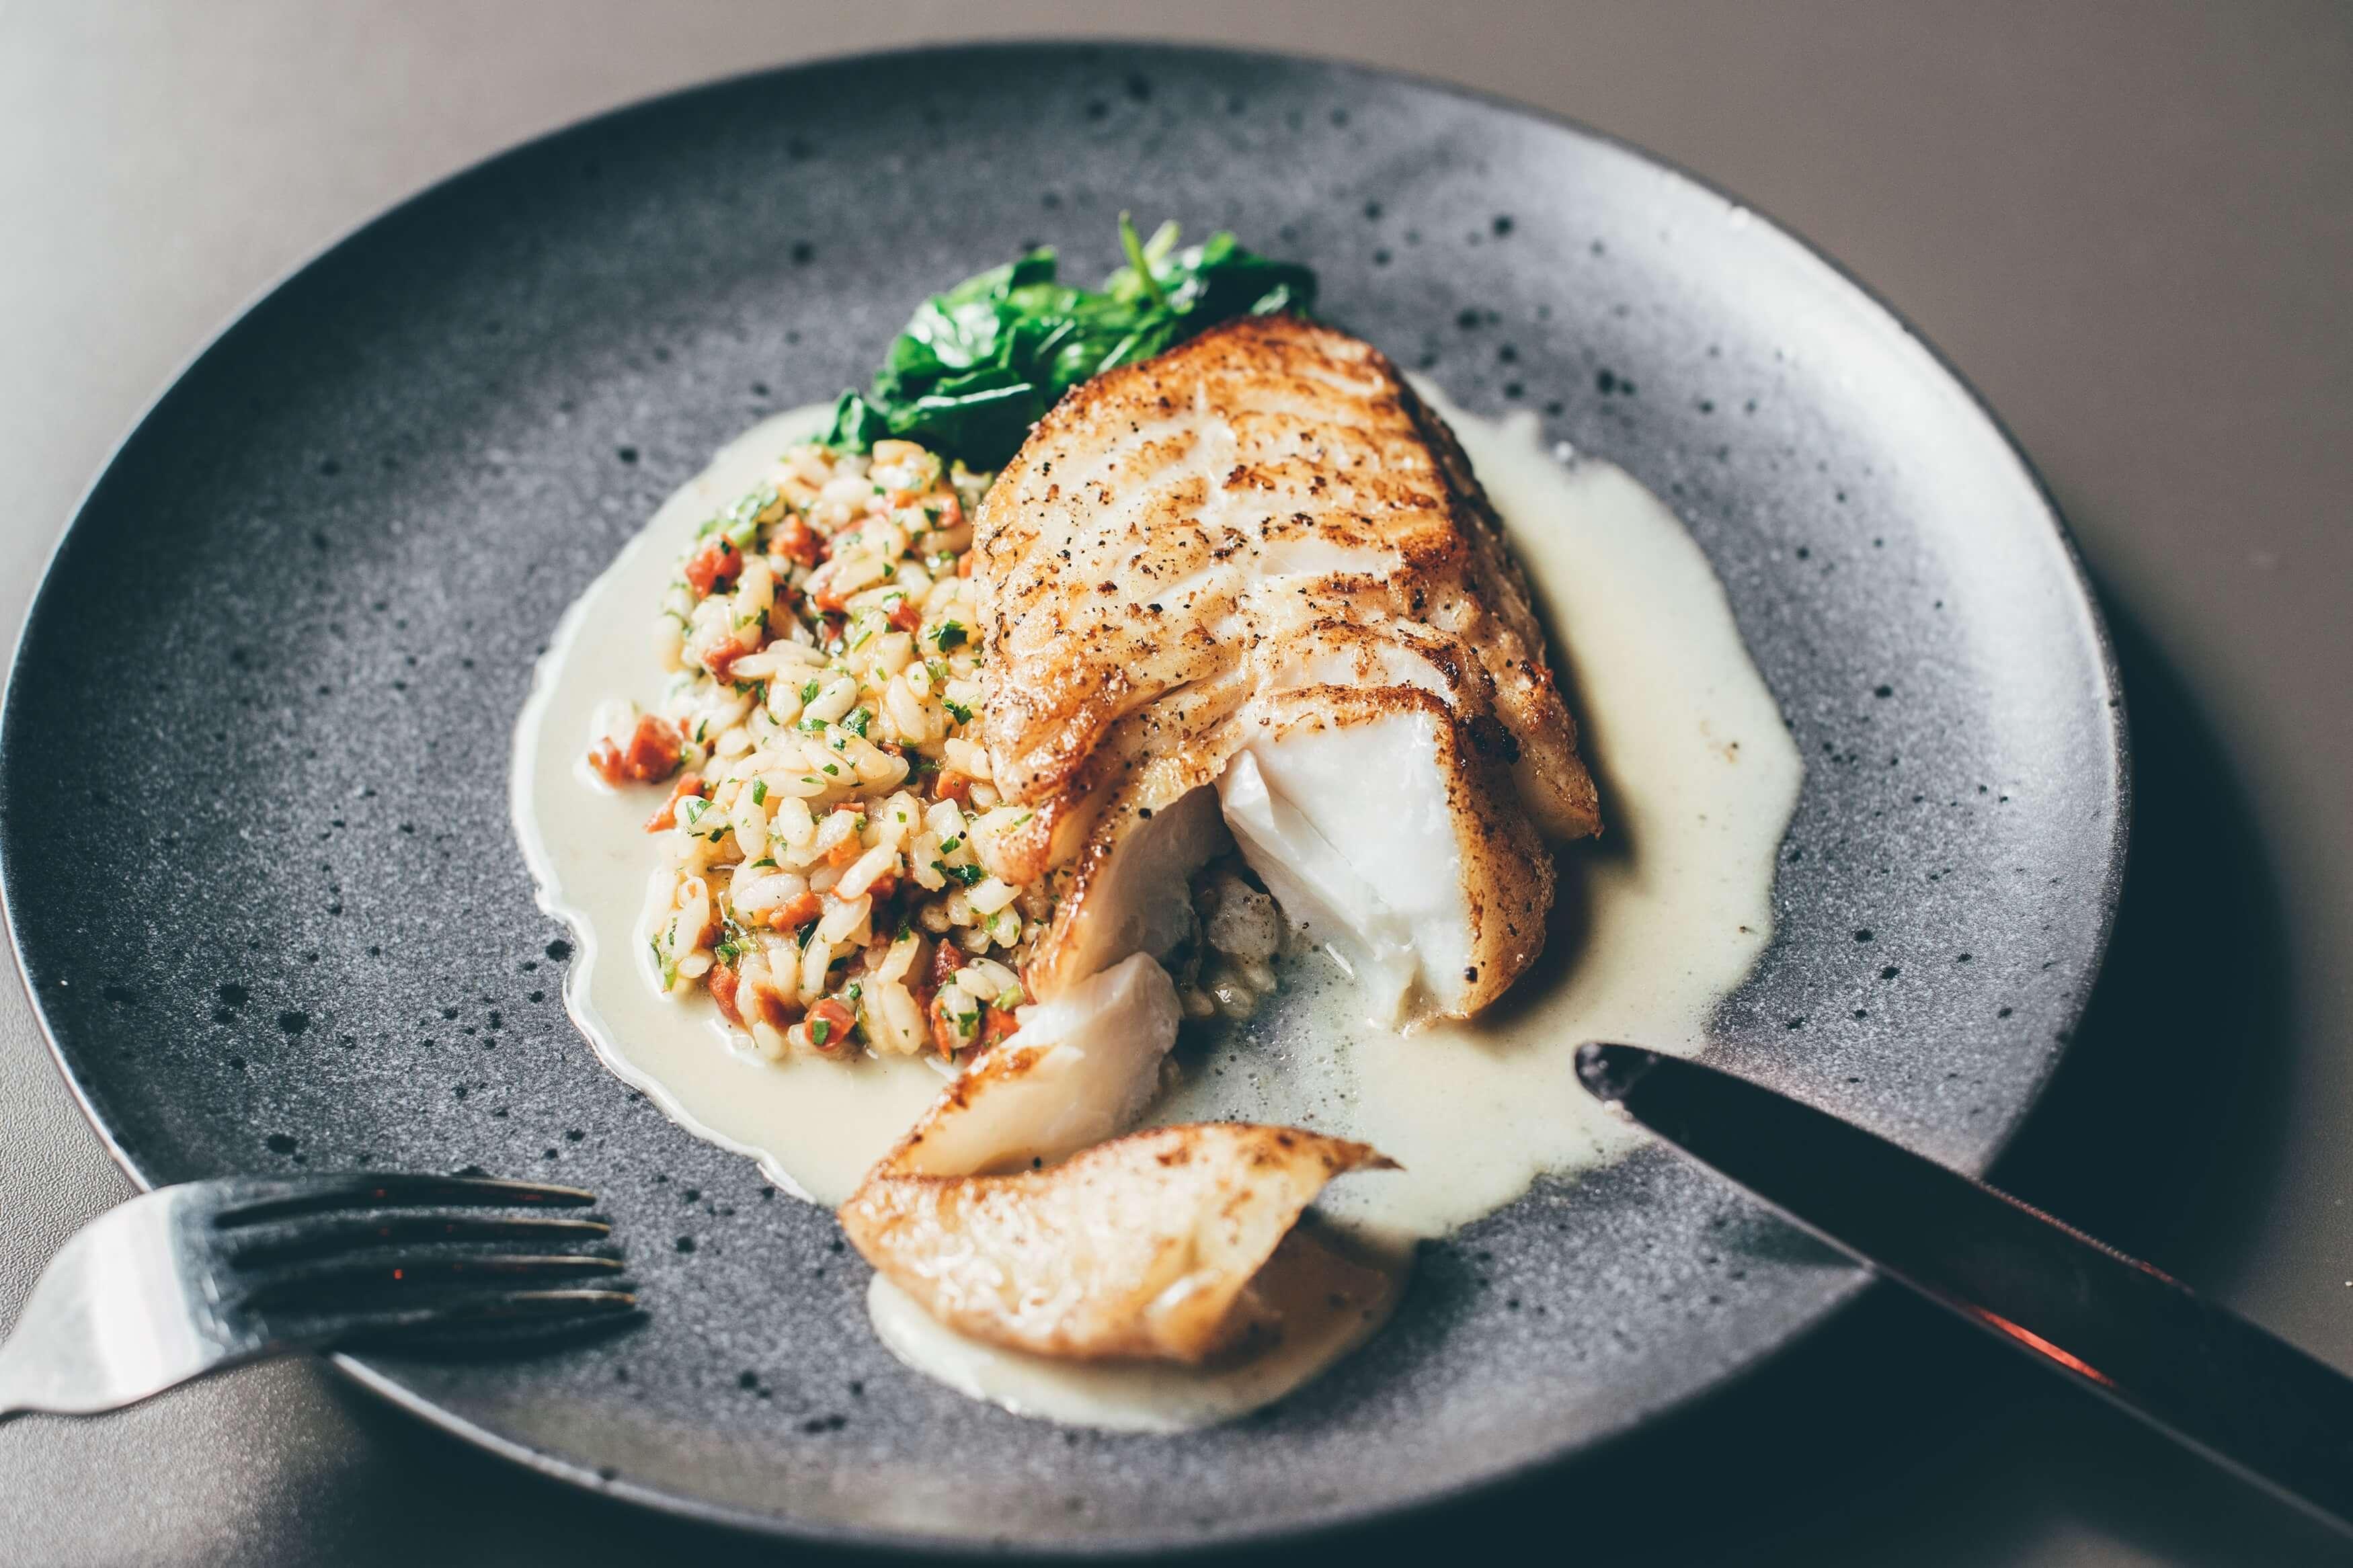 Fish at Krew i Woda Restaurant in Gdynia